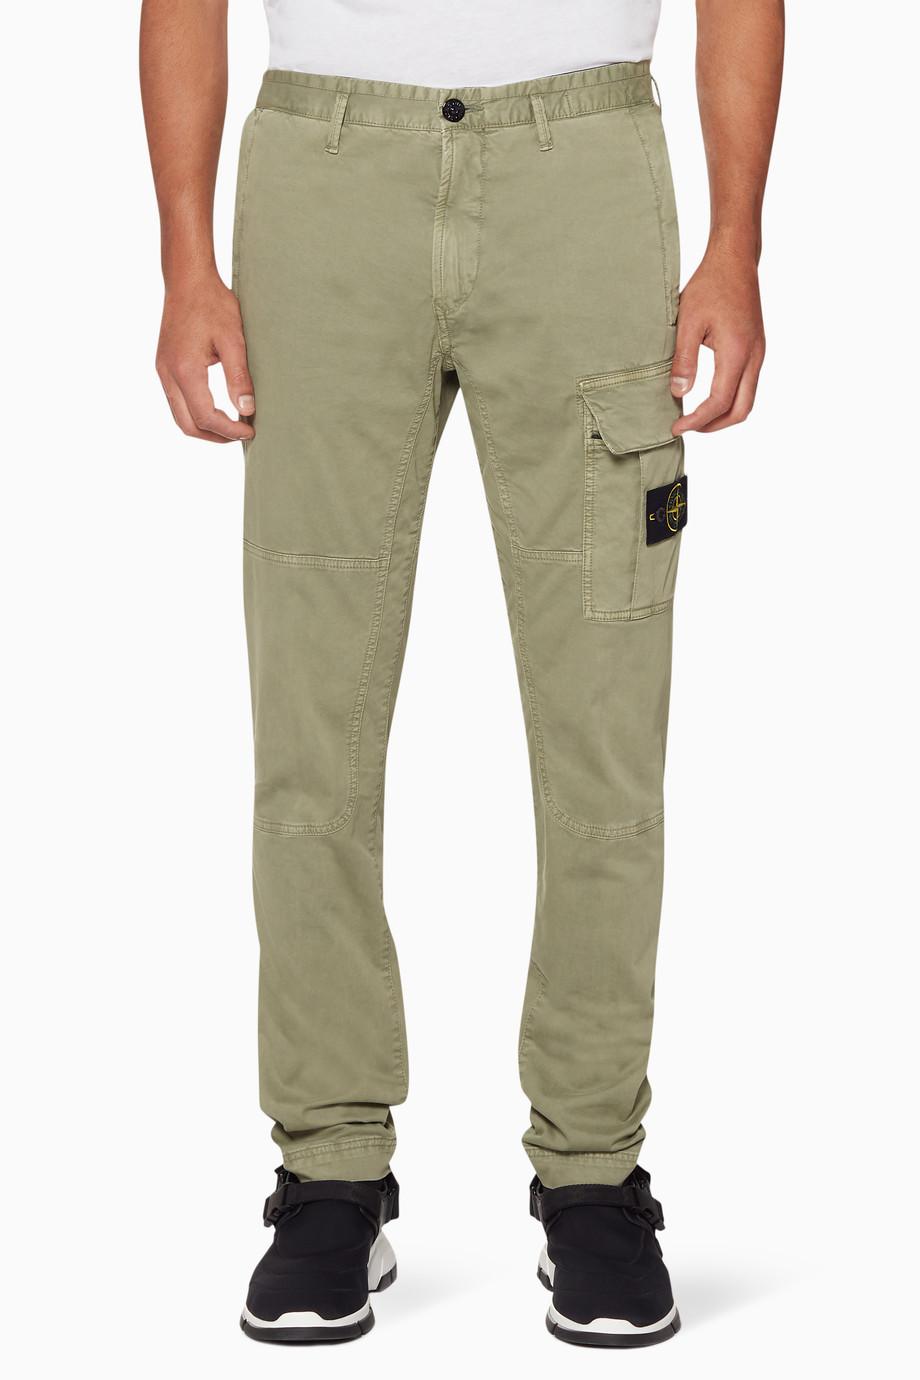 c7442802c Shop Stone Island Green Light-Green Cargo-Pocket Track Pants for Men ...